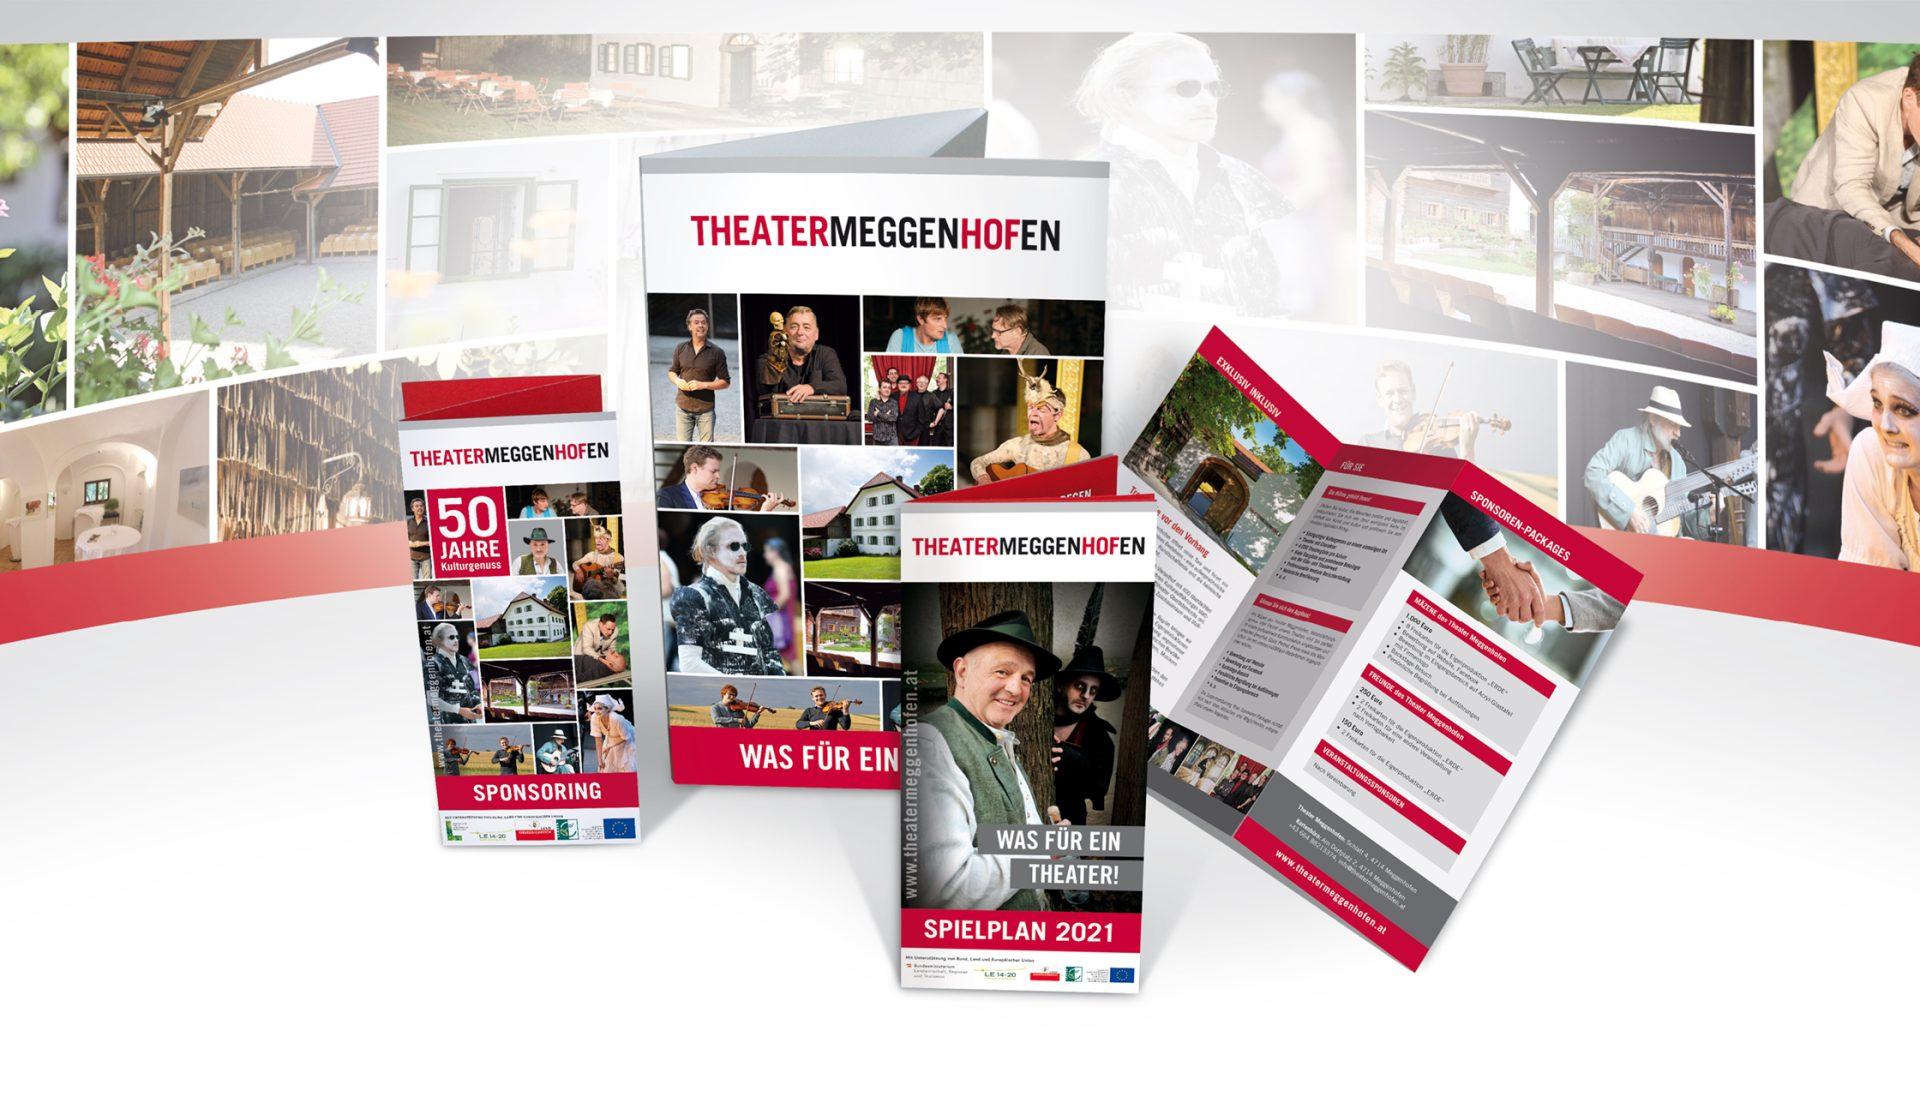 Theater Meggenhofen Werbemittel 2021